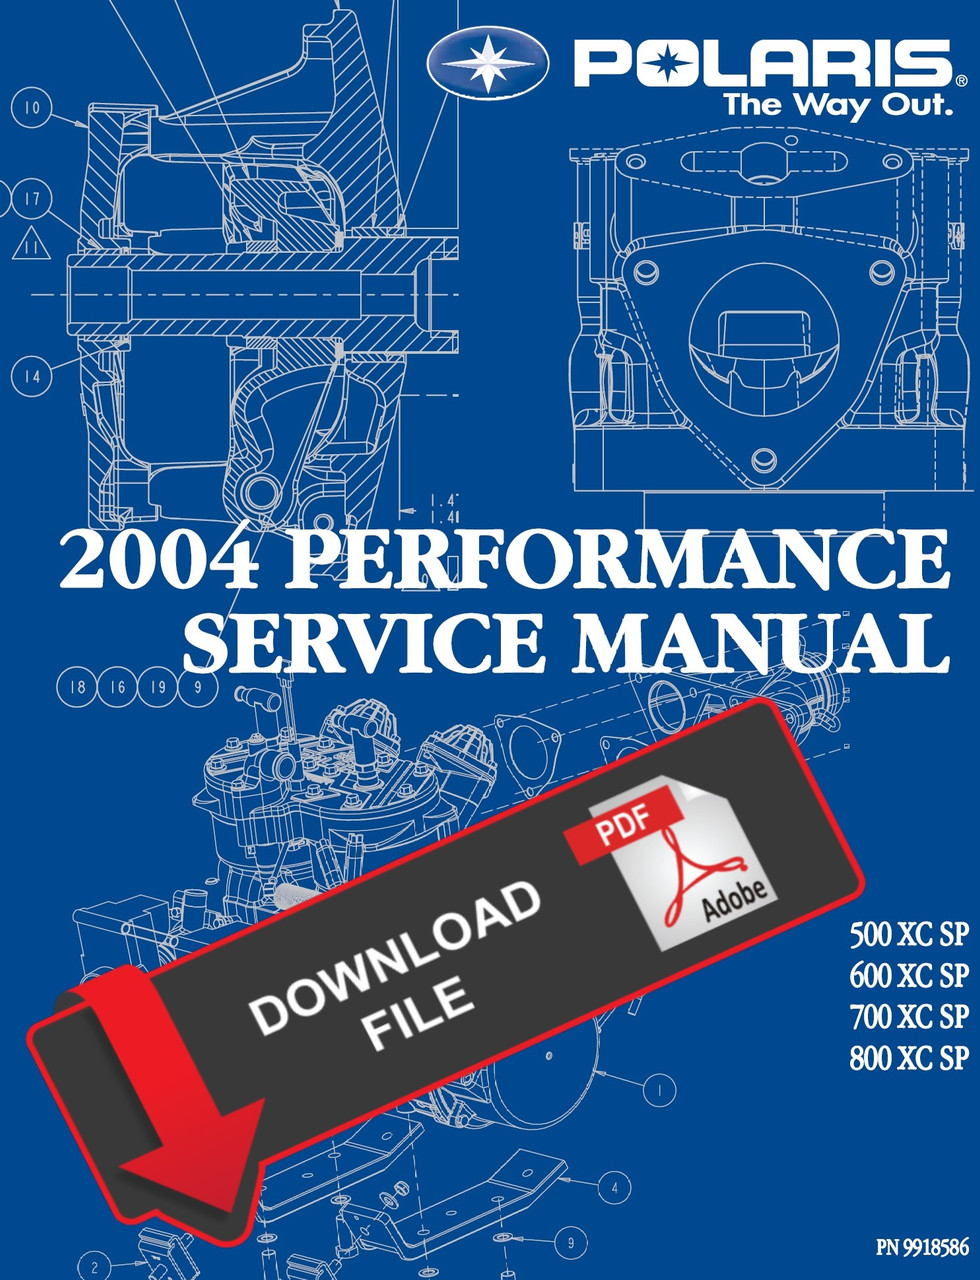 Polaris 2004 800 XC SP Service Manual on